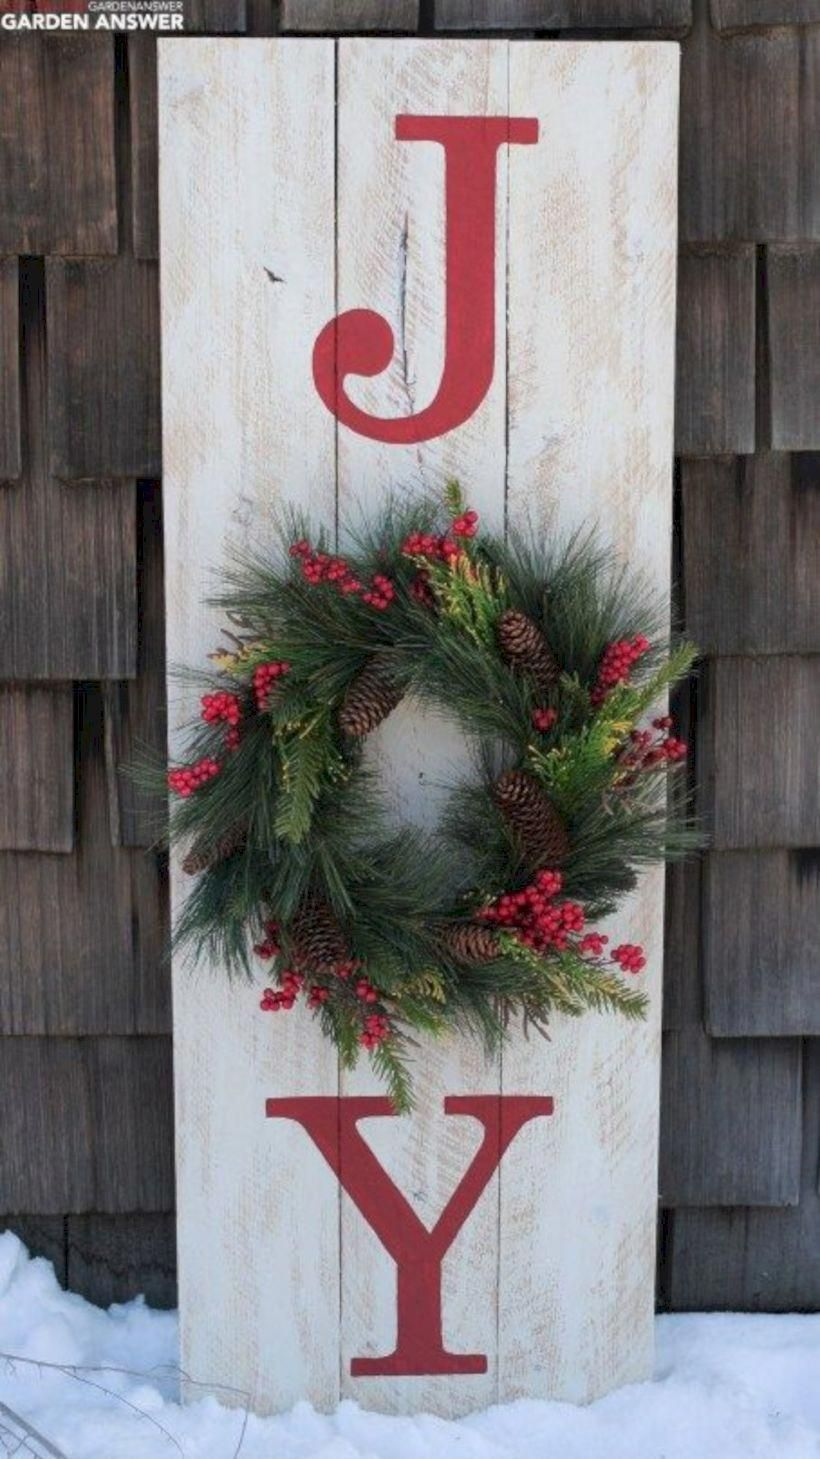 diychristmas Christmas decorations diy outdoor, Outdoor